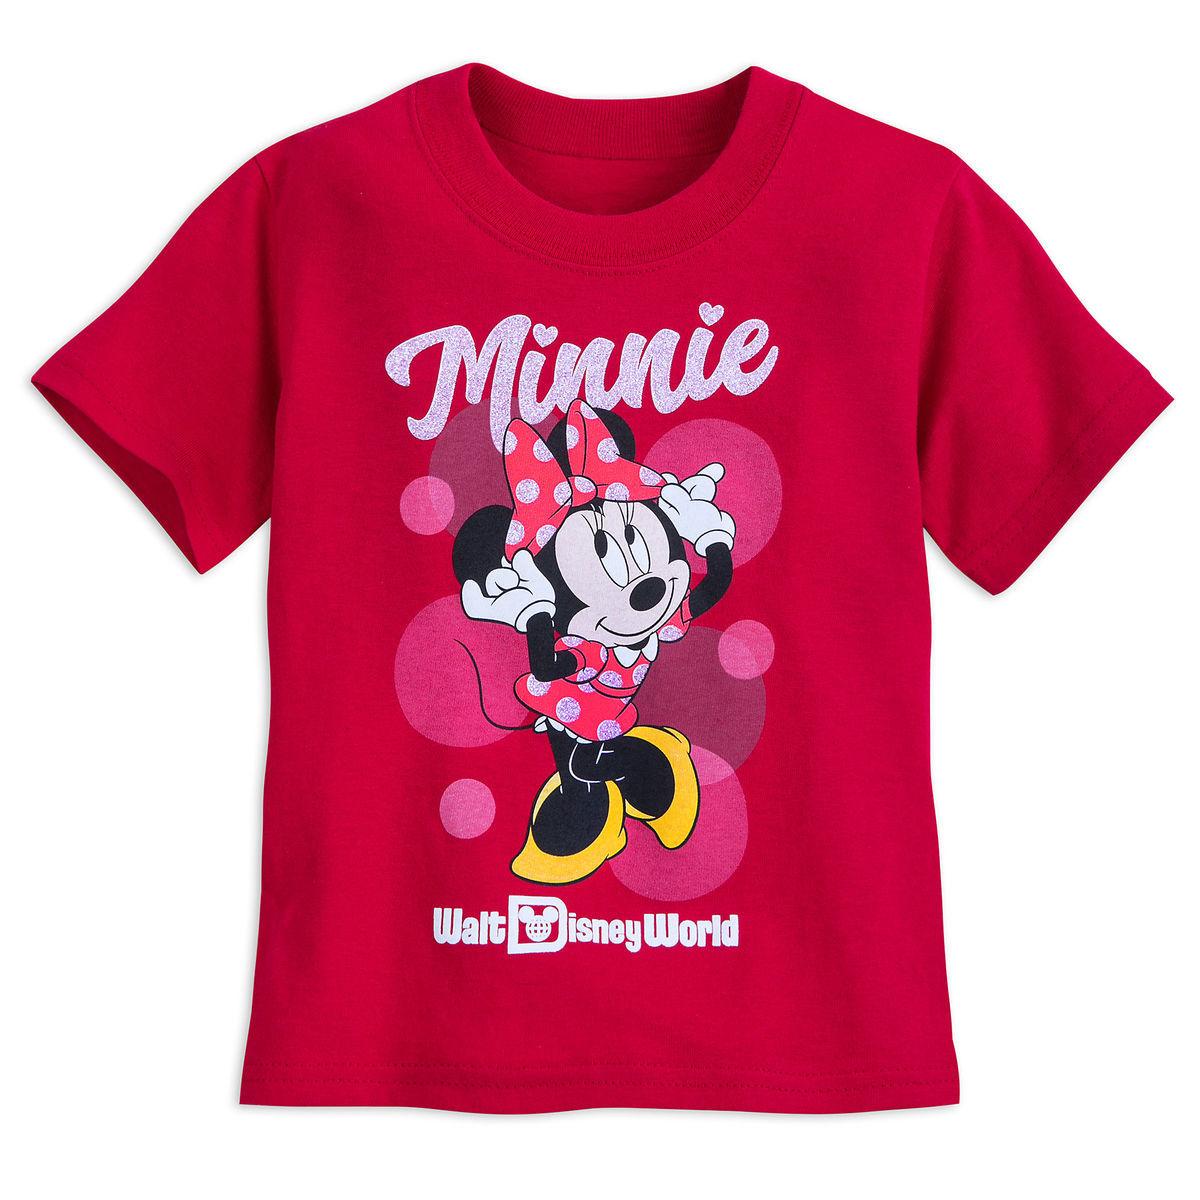 d3cdd4a5b31 Add to My Lists. Disney Toddler s Shirt - Minnie Mouse Glitter T-Shirt for  Girls